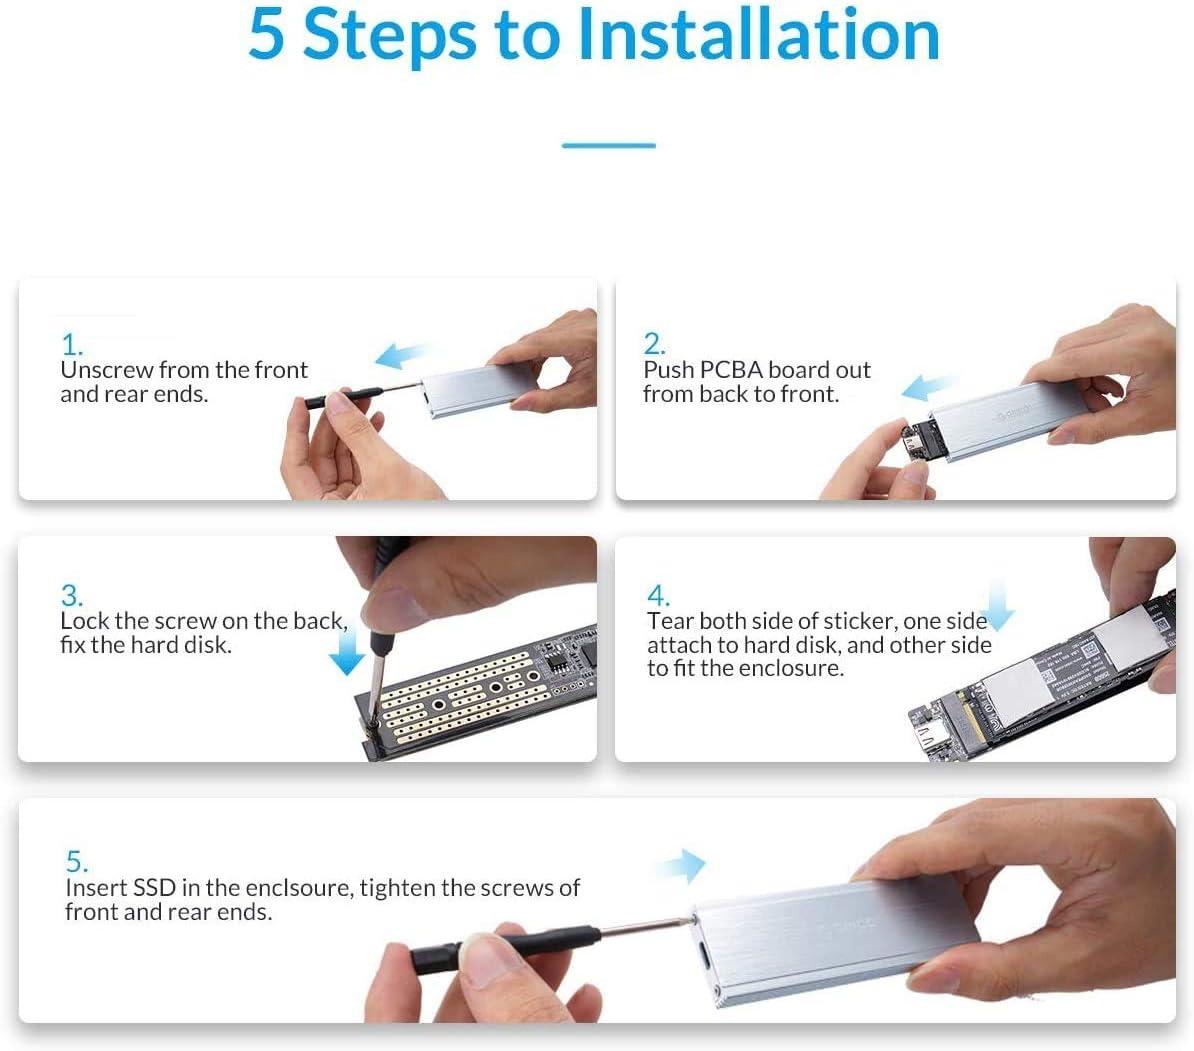 Funci/ón de sue/ño Inteligente ORICO Carcasa Externa SSD M.2 NVME Caja de Aluminio und Adaptador de PCIe a USB 3.1 para PCIe M-Key /& M+B Key NVME SSD 2230//2242//2260//2280 Plata Gen2, 10 Gbit//s